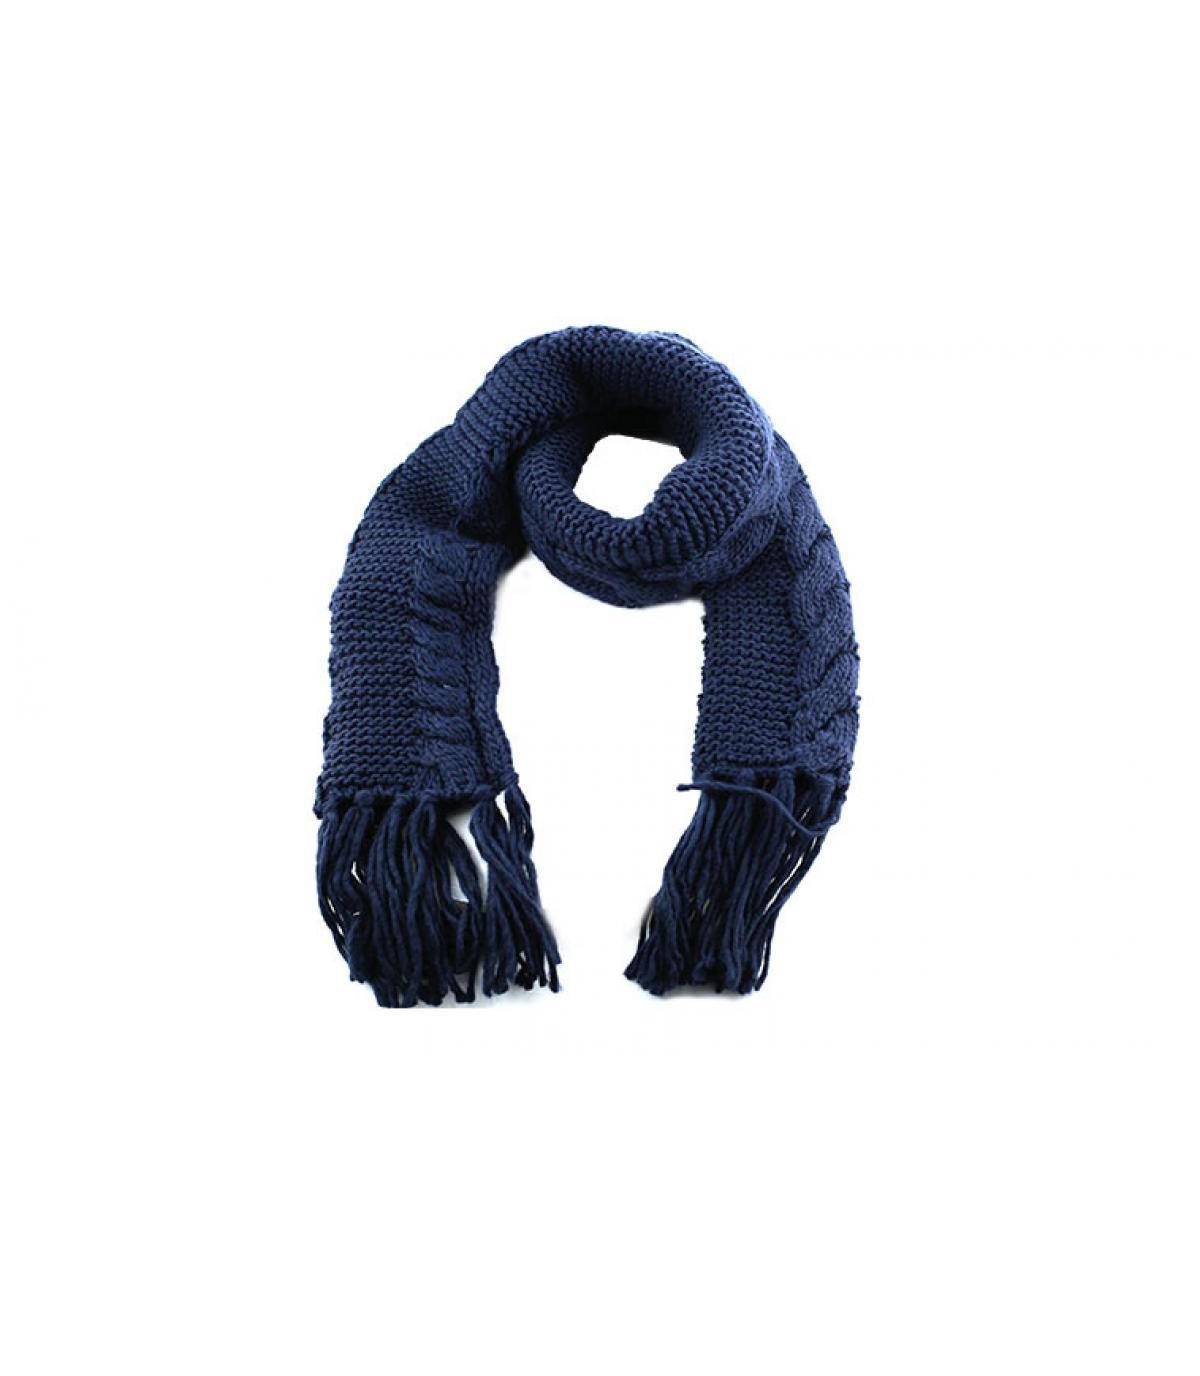 Navy sciarpa con frange